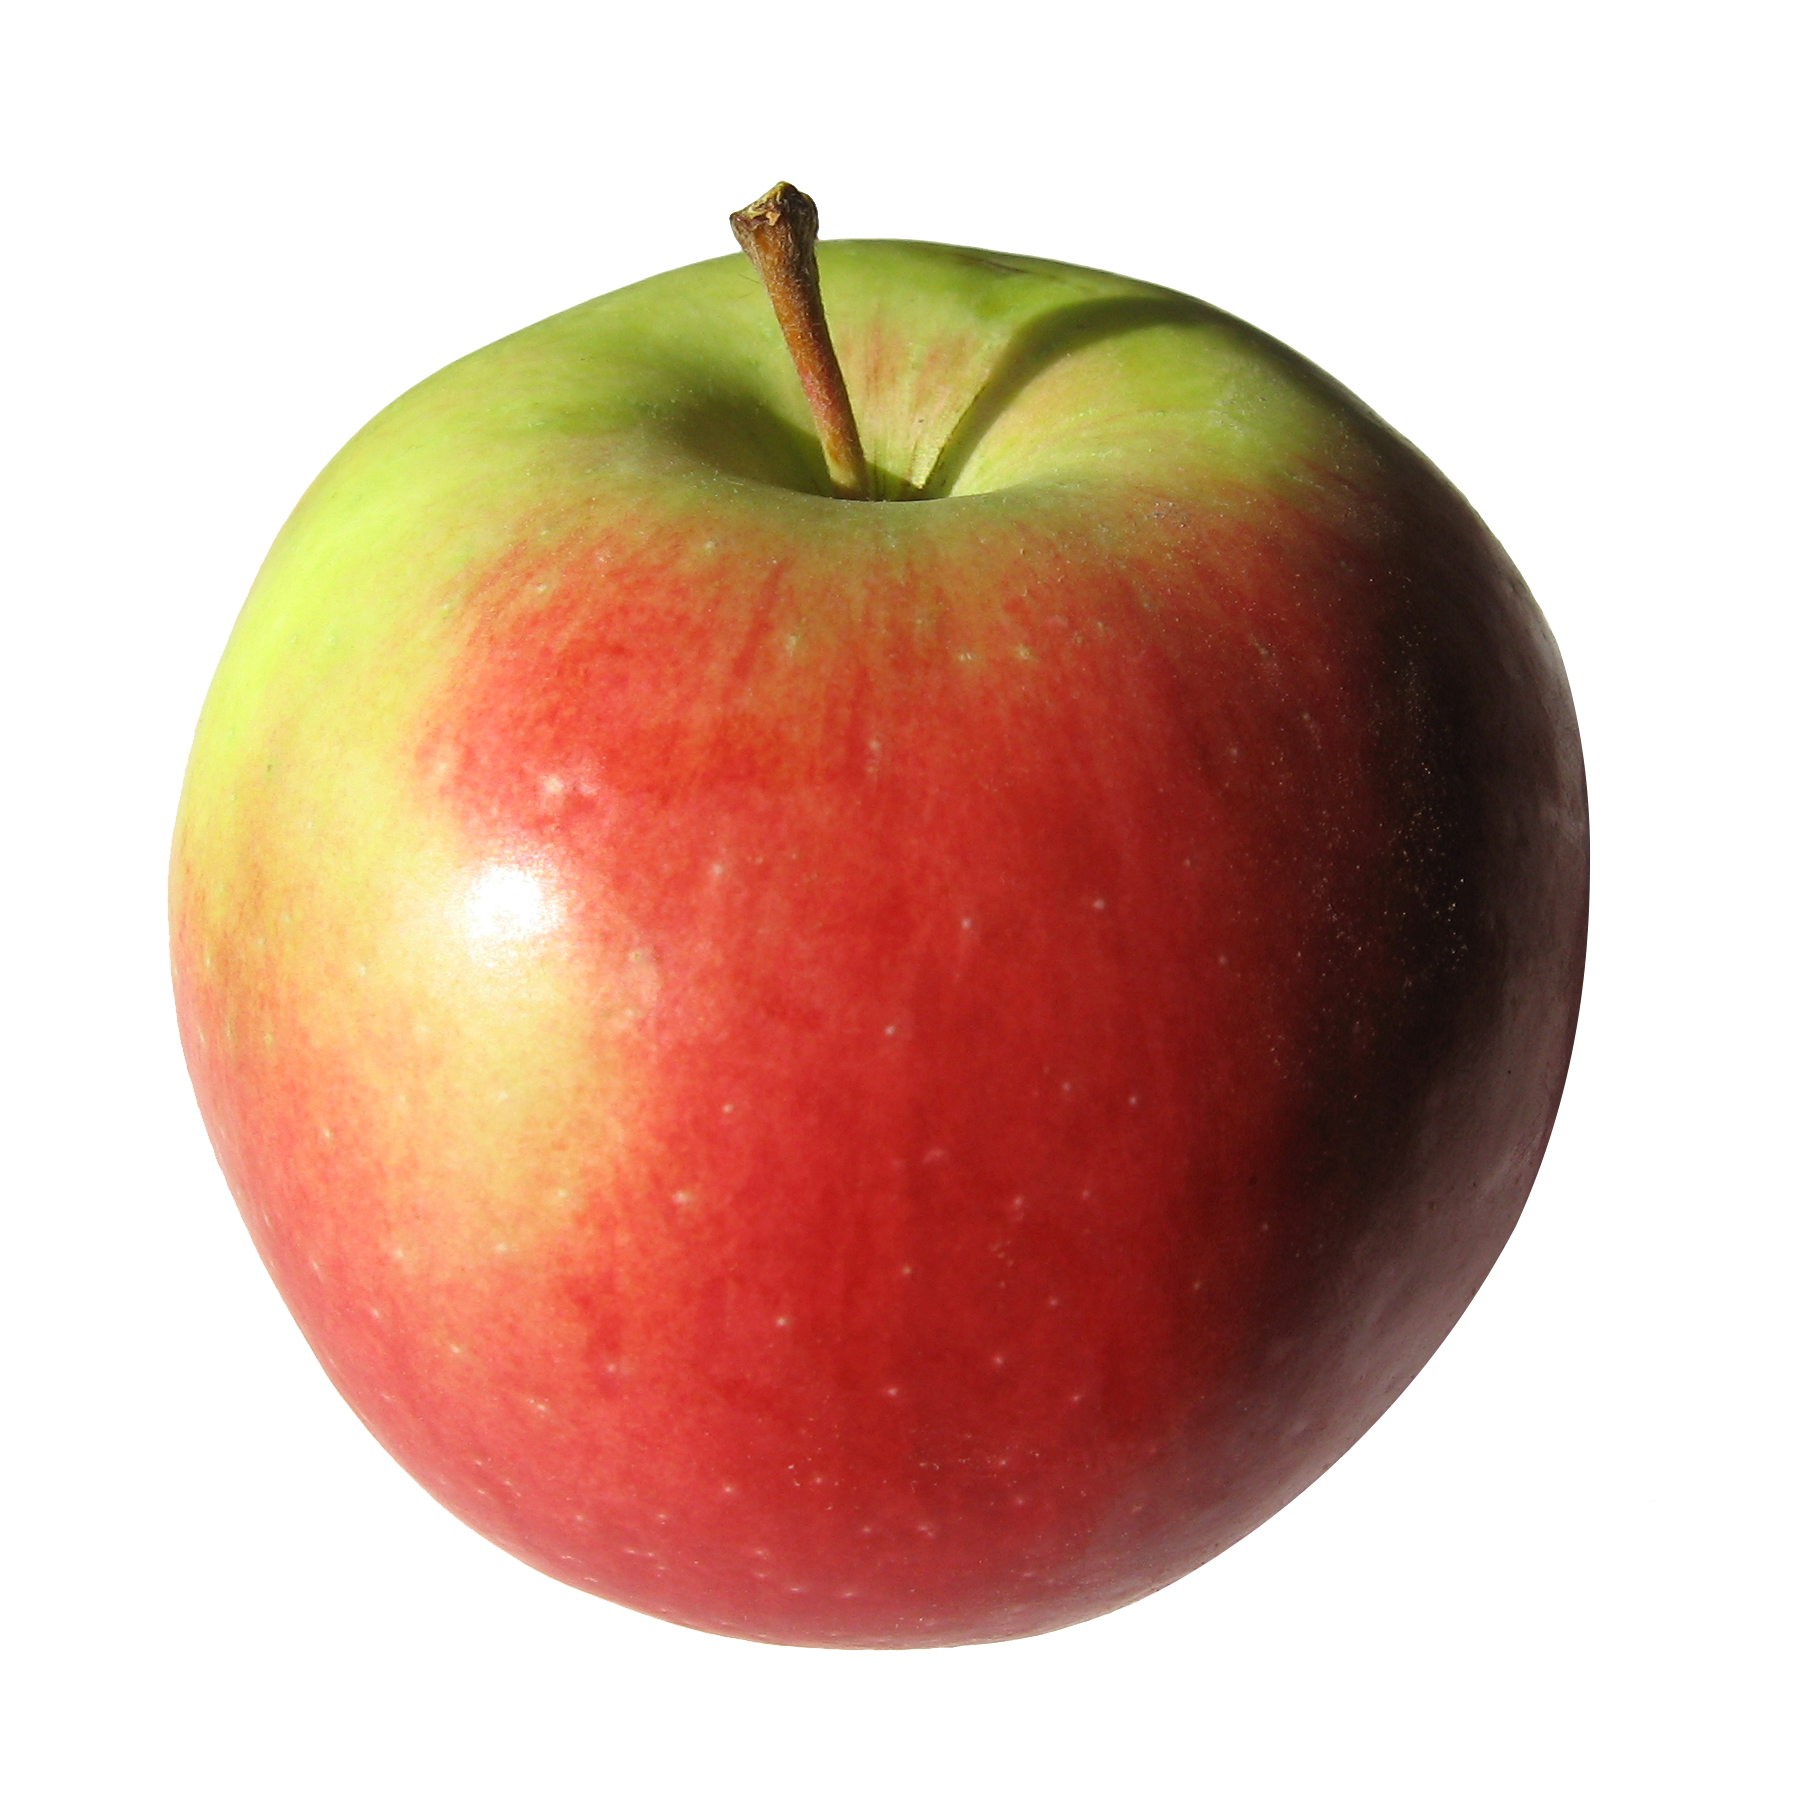 Apple | Free Images at Clker.com - vector clip art online ...